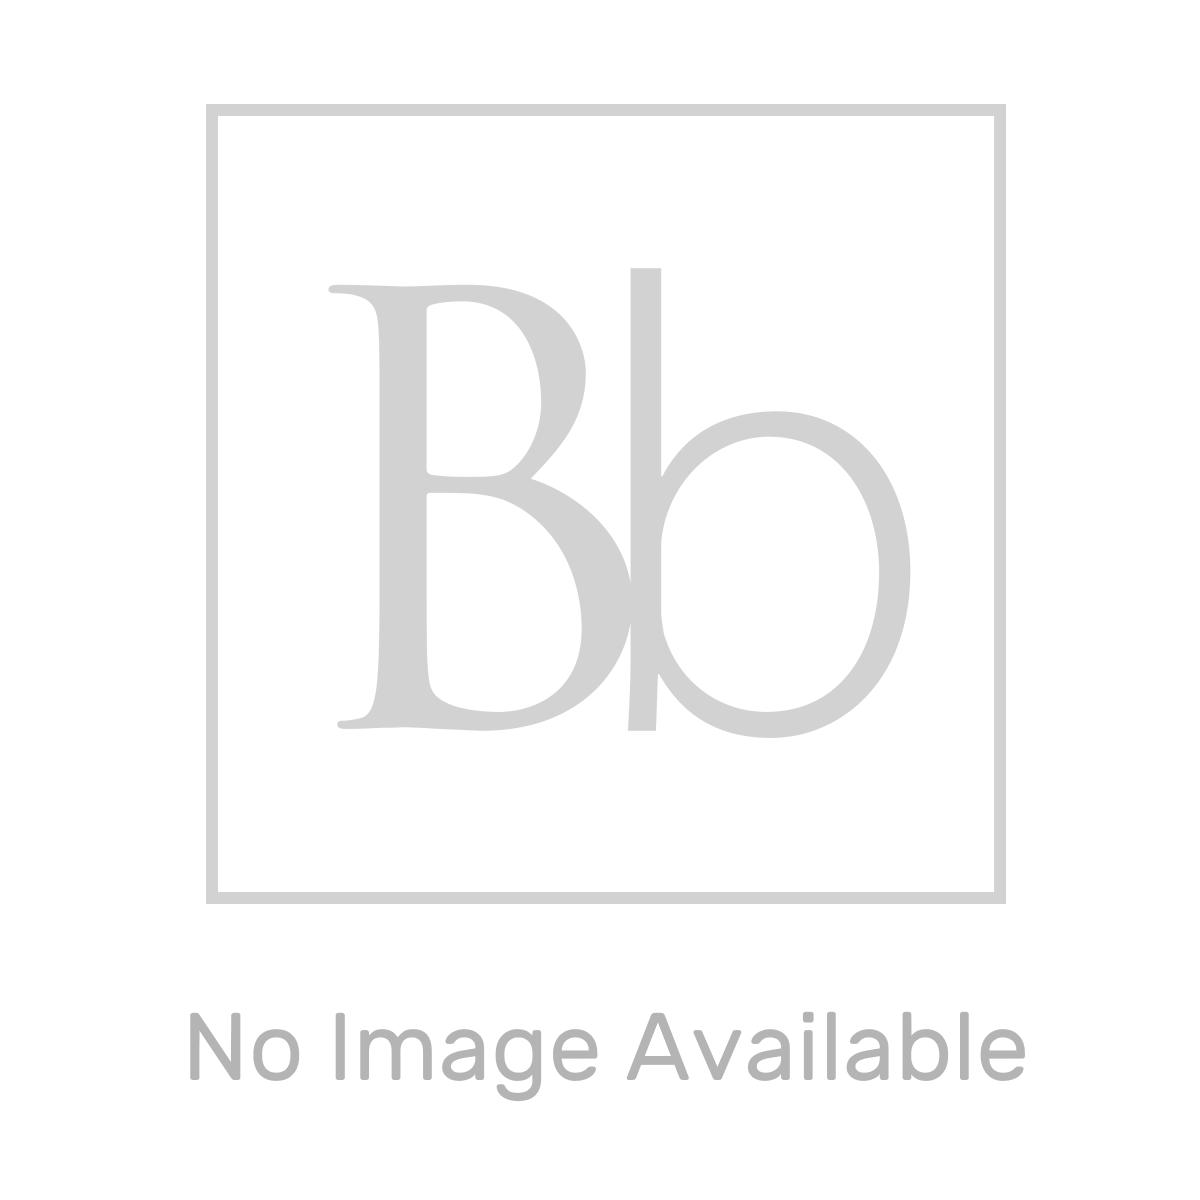 Reina Artena Polished Single Panel Steel Radiator 590 x 400mm